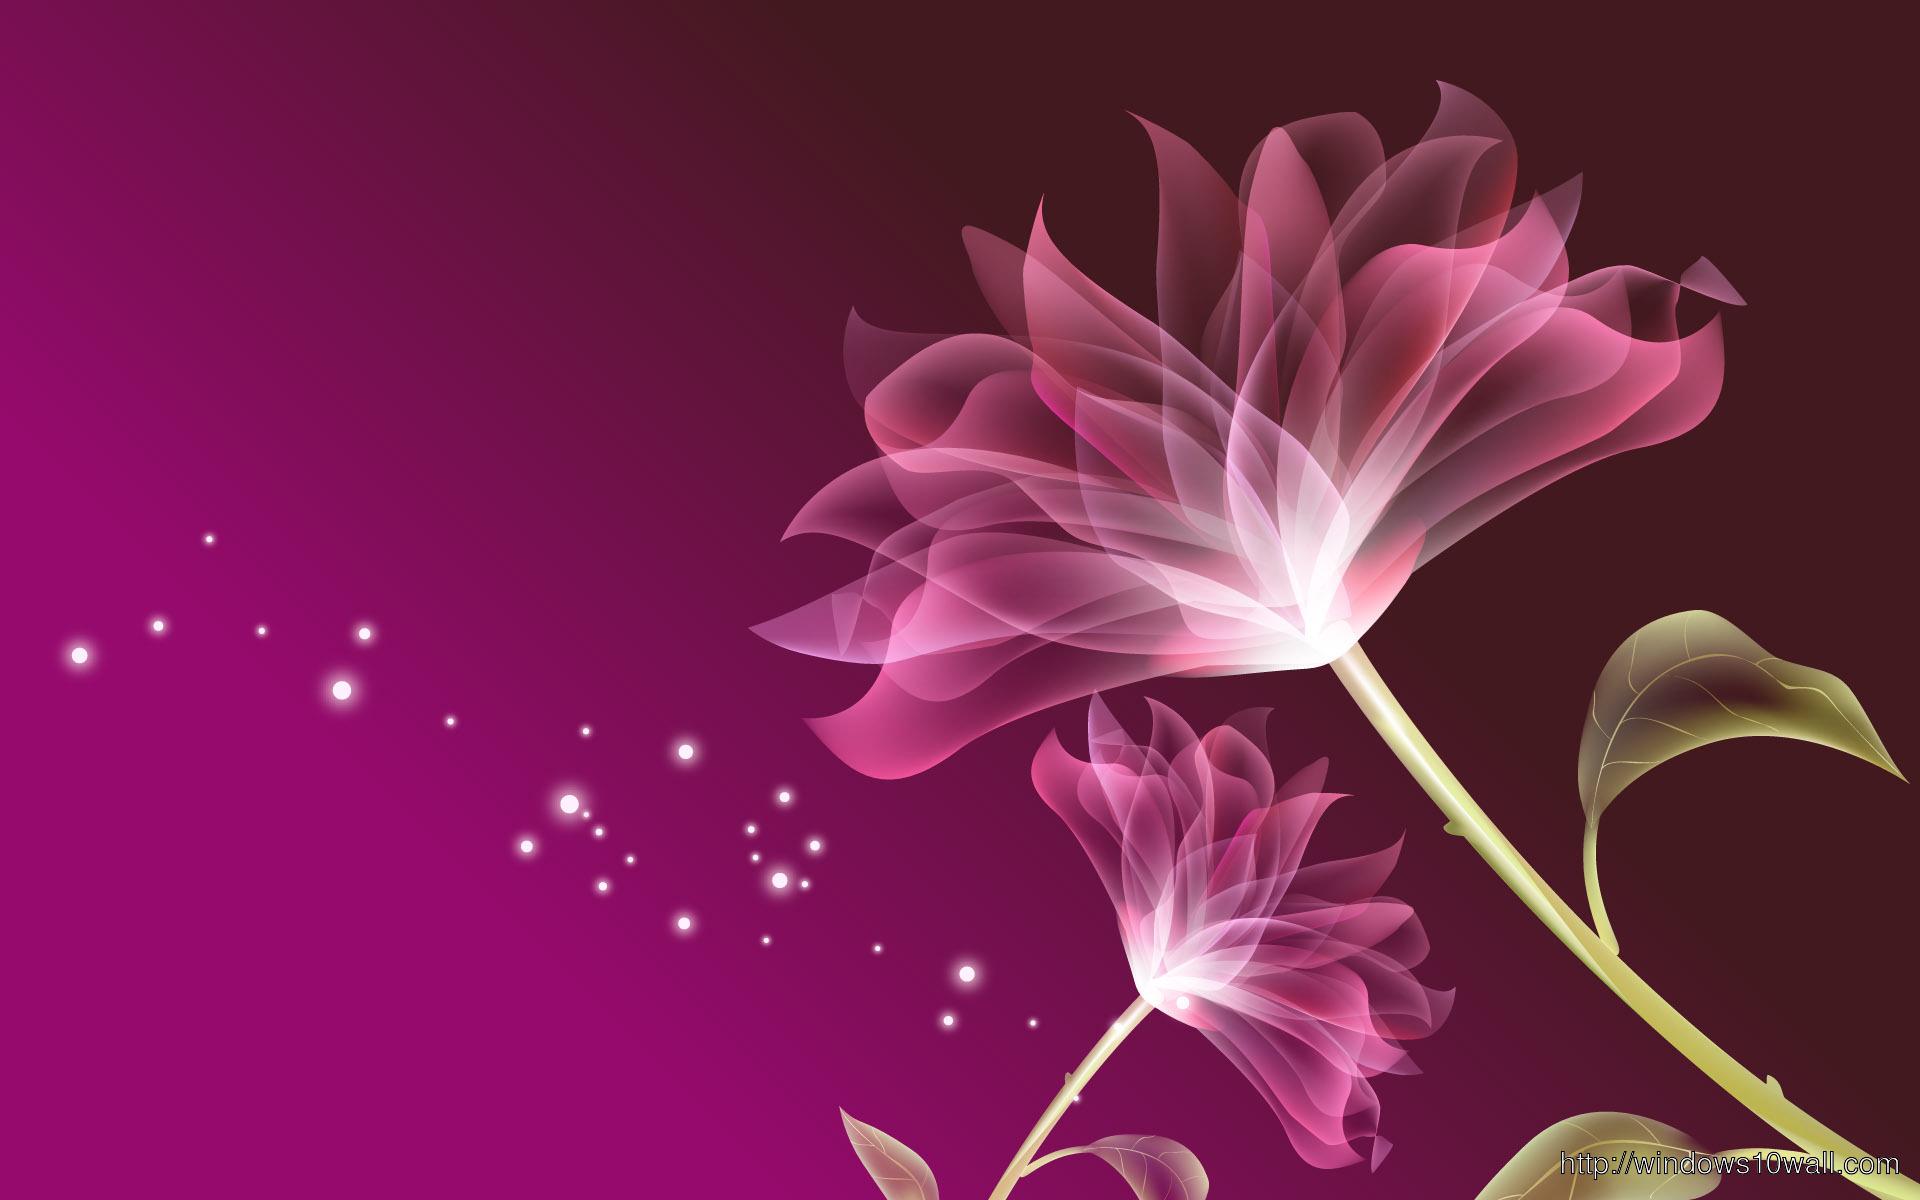 Cg Pink Flower Free Wallpapers 2013 Free Download